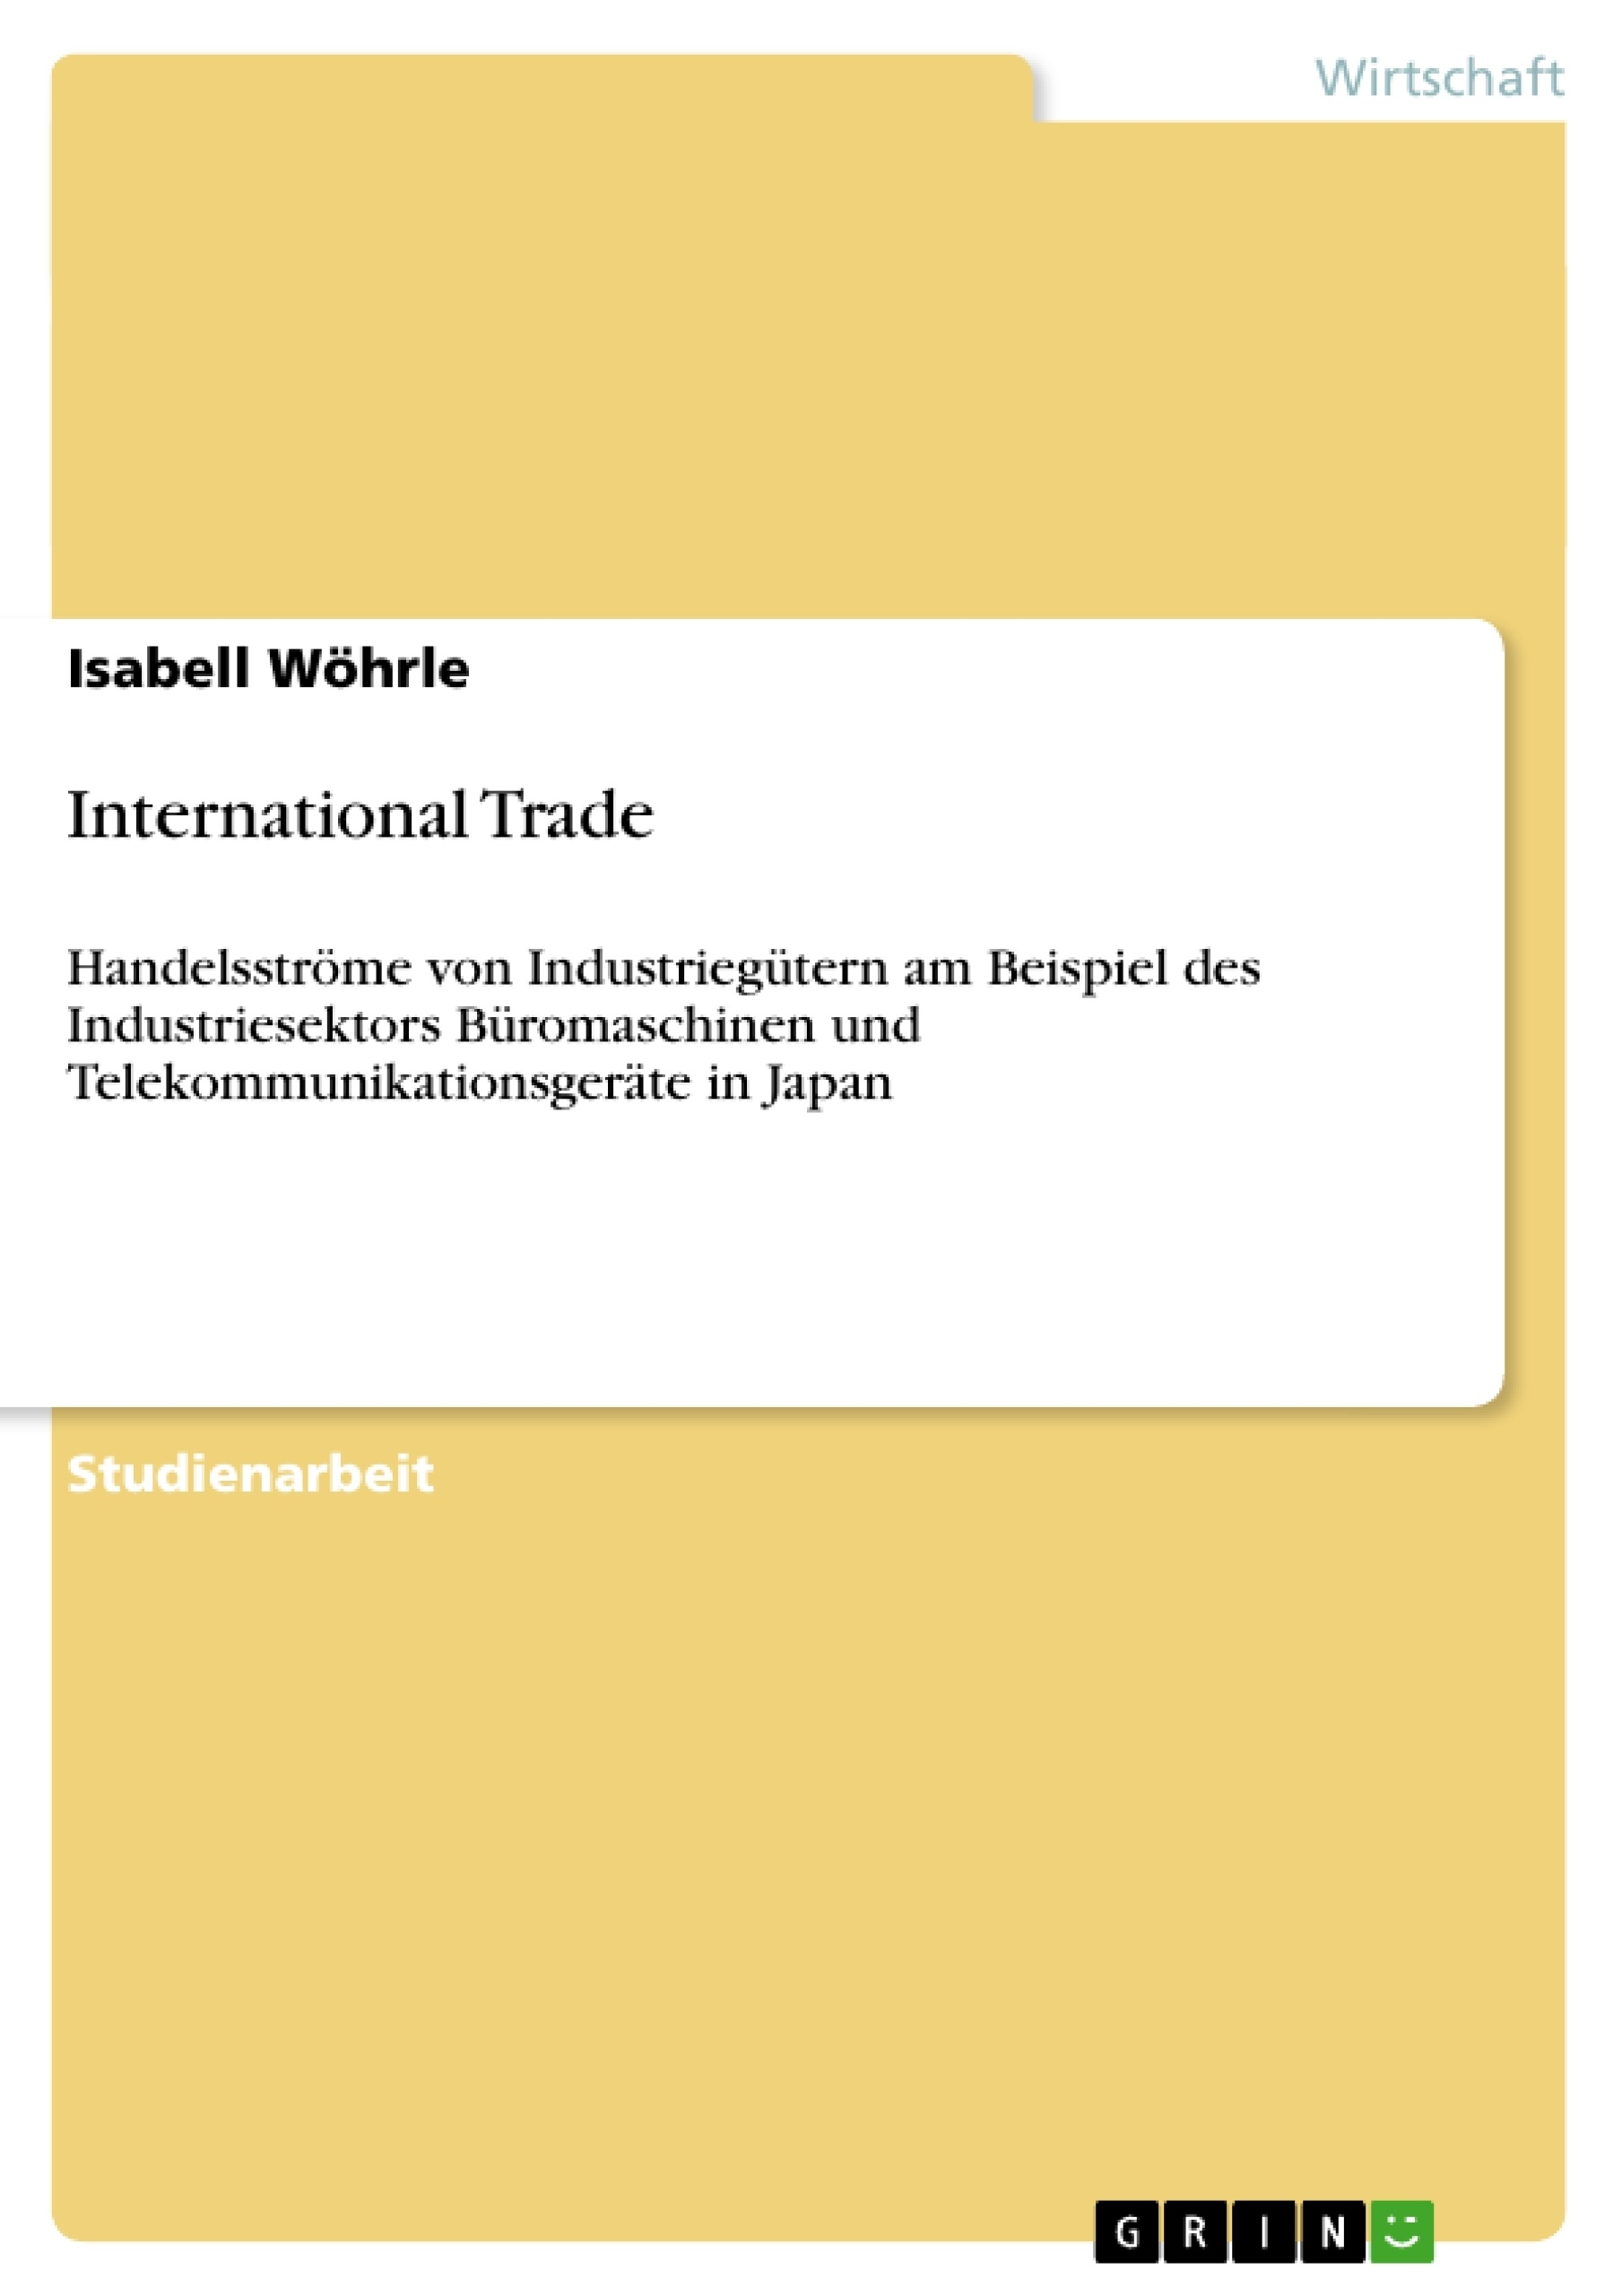 Titel: International Trade